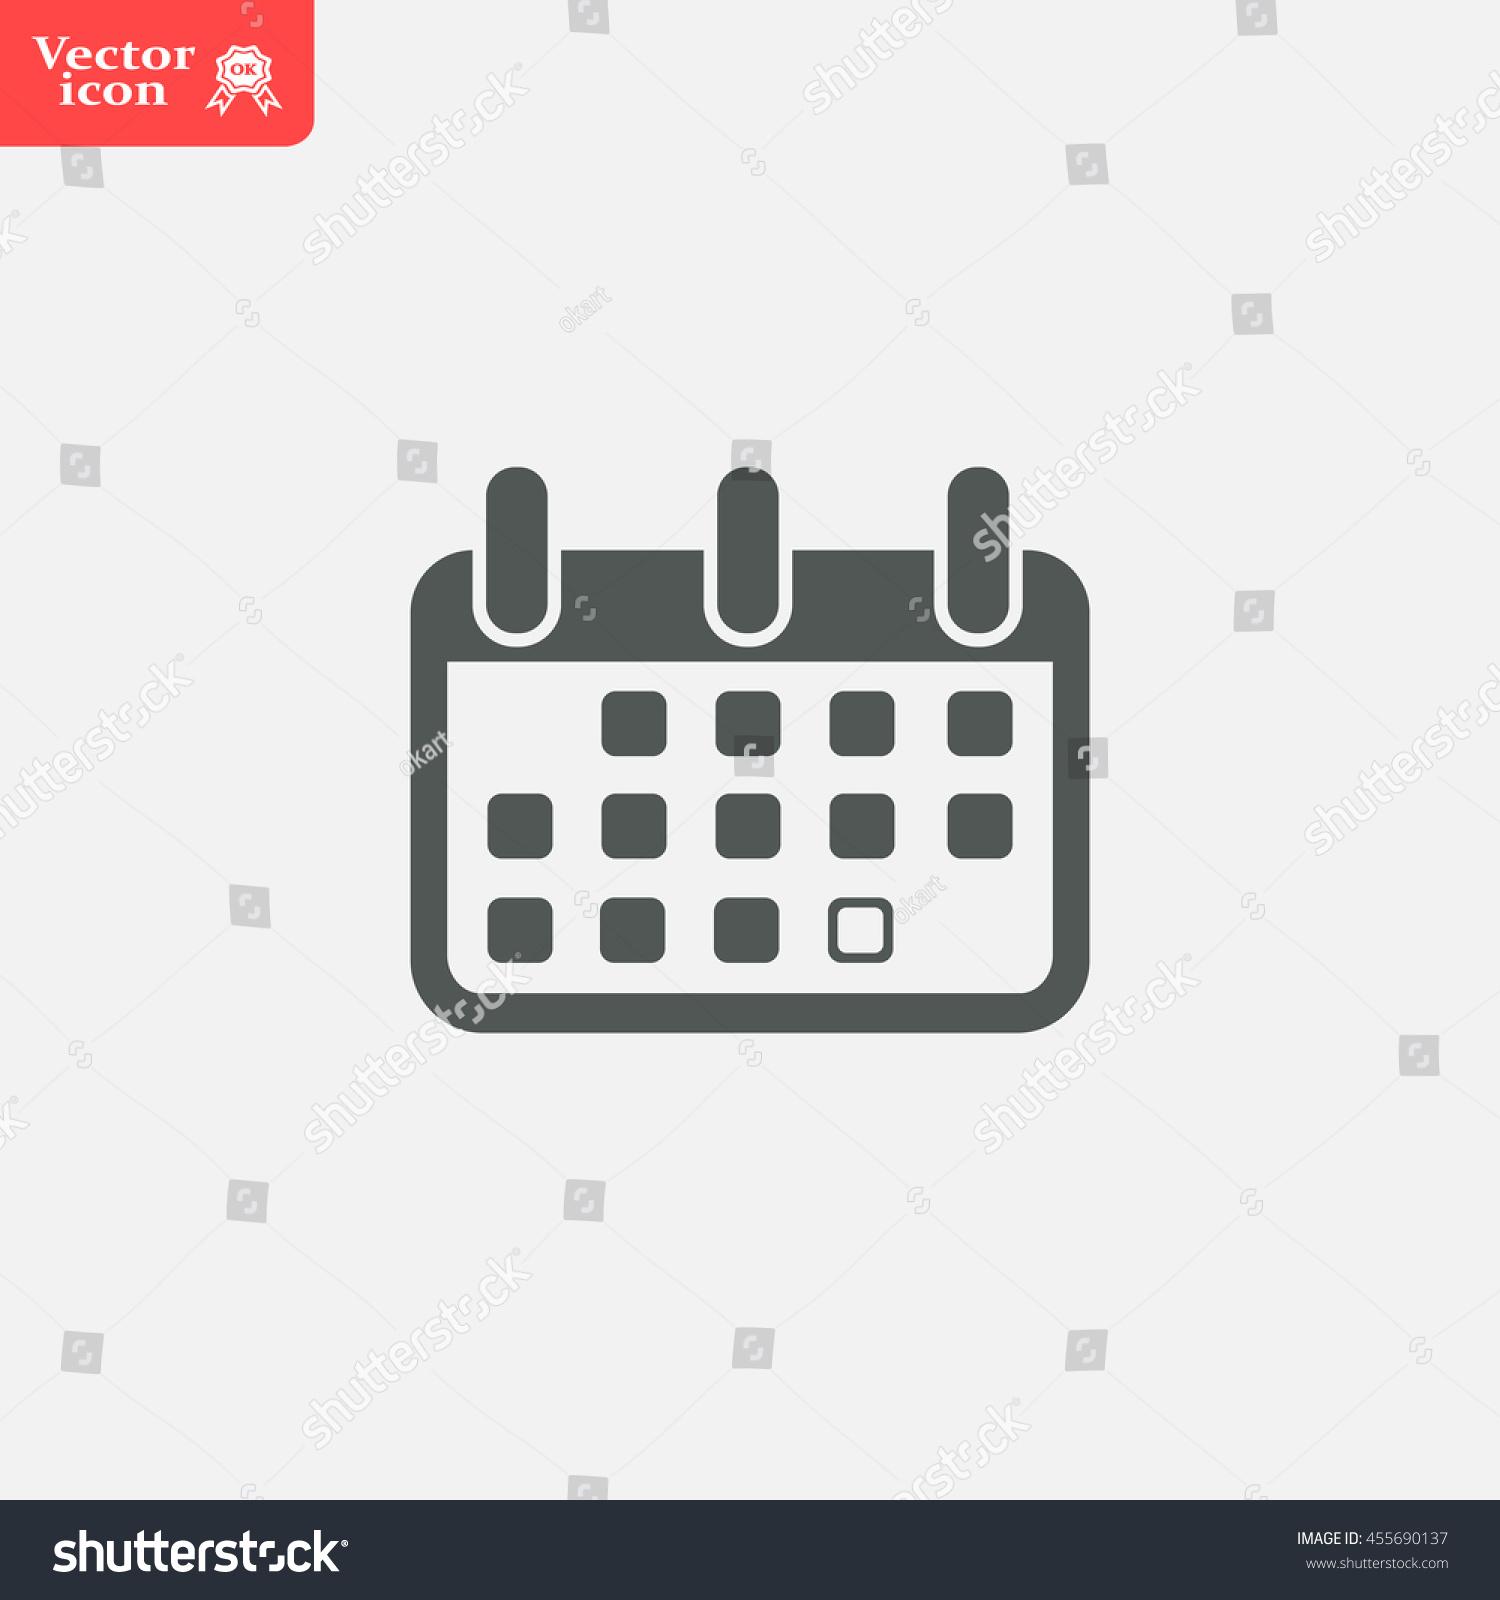 Calendar Flat Illustration : Calendar icon vector illustration flat design style